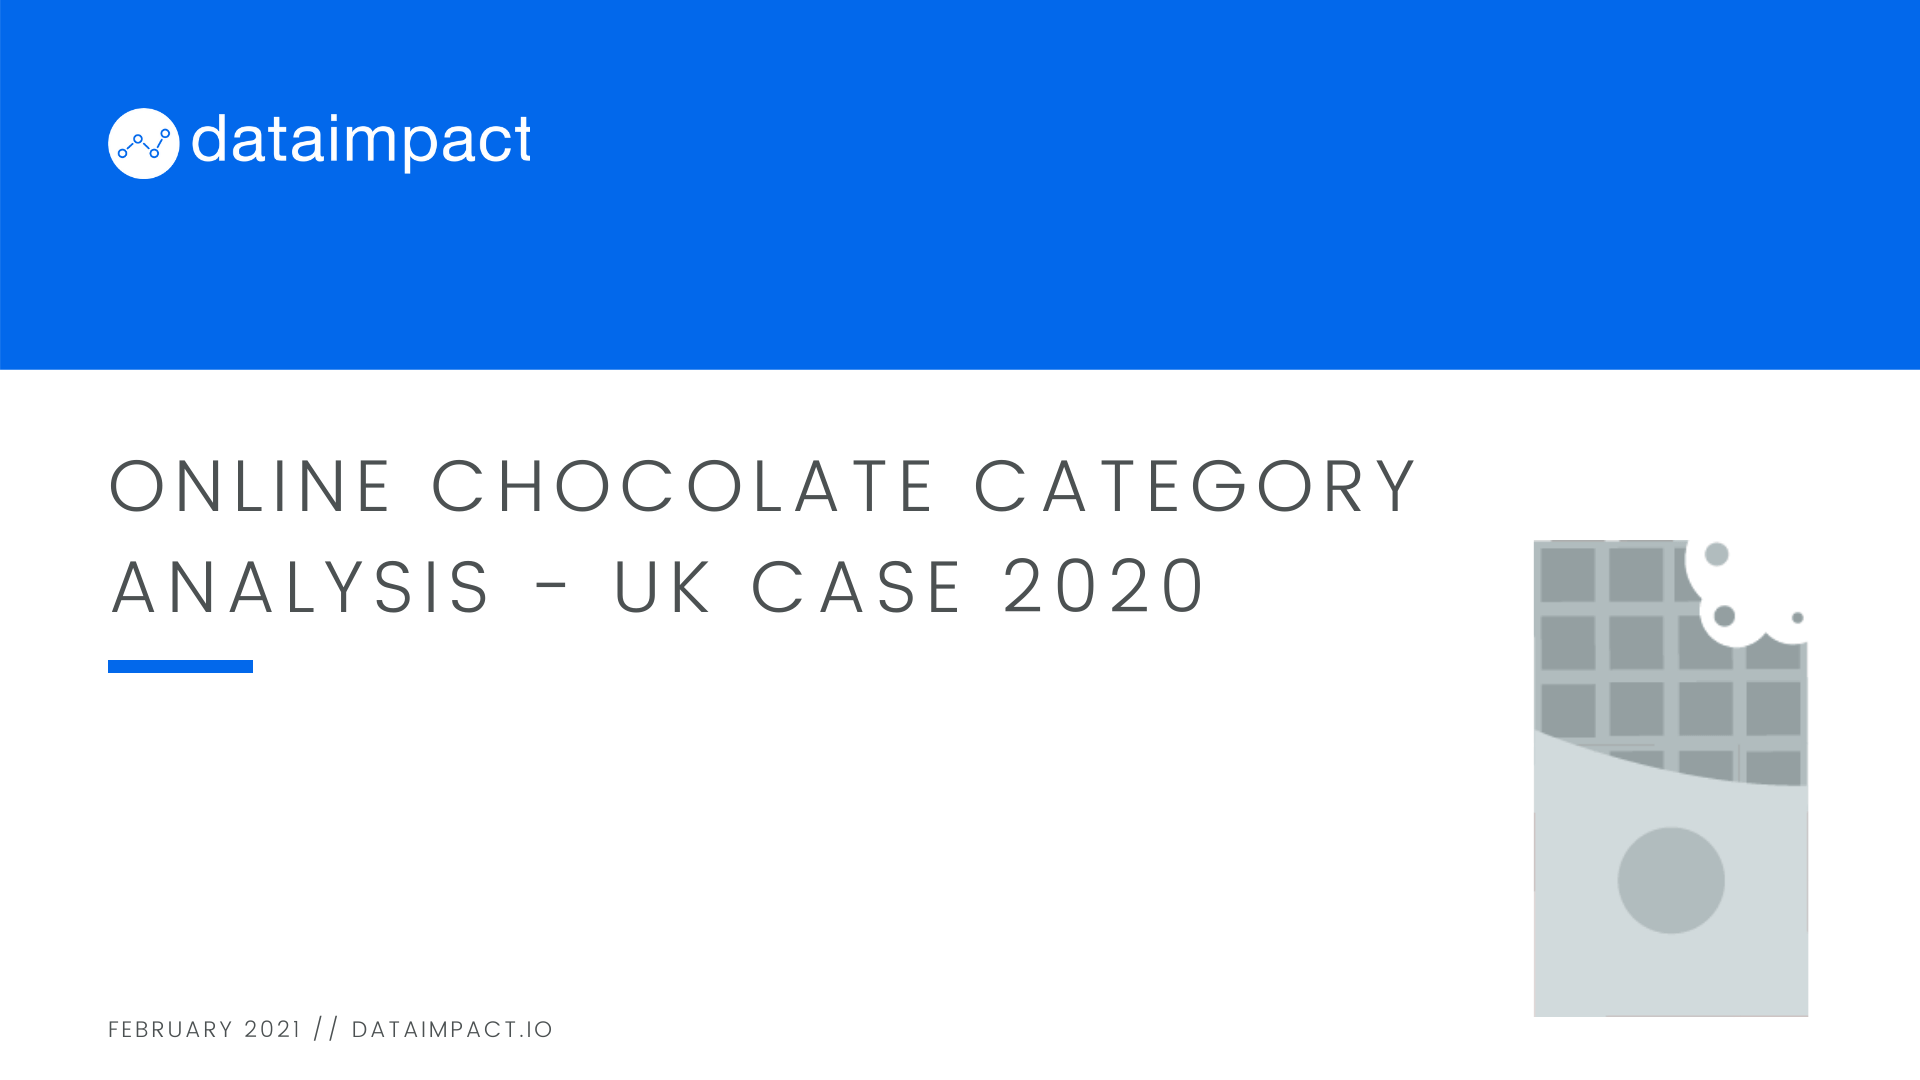 Chocolate online category analysis 2020 uk case